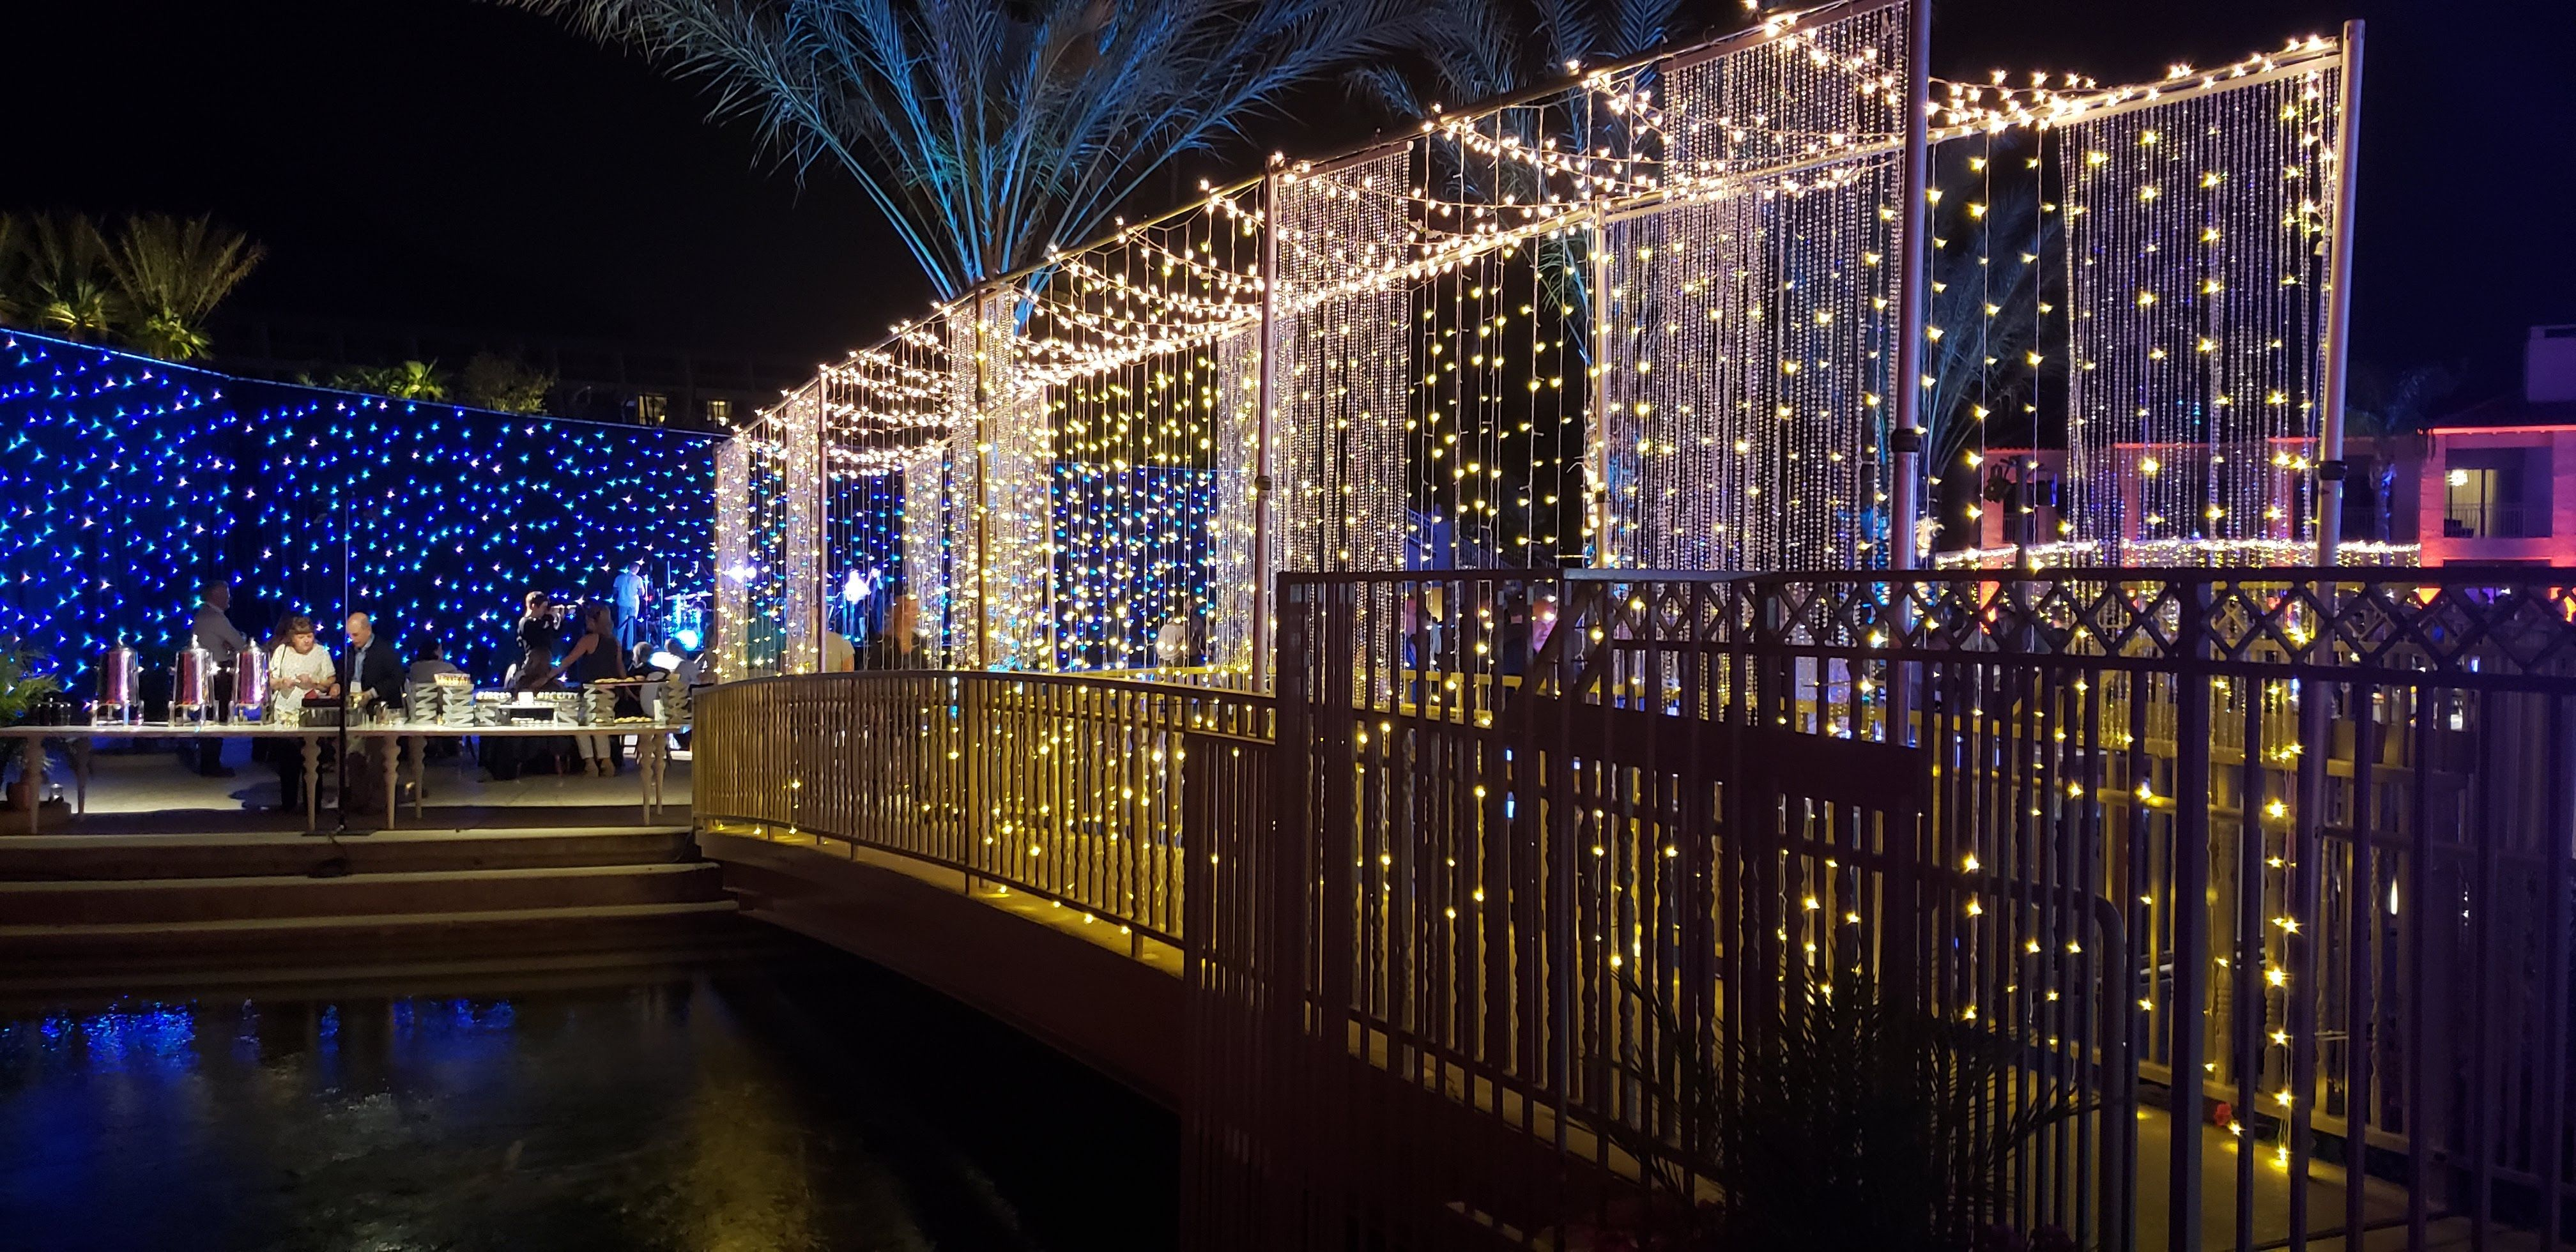 Fiber Optic Drape And Twinkle Light Curtains Drape Lighting Design Decor Event Curtain Lights Event Marketing Event Twinkle Lights